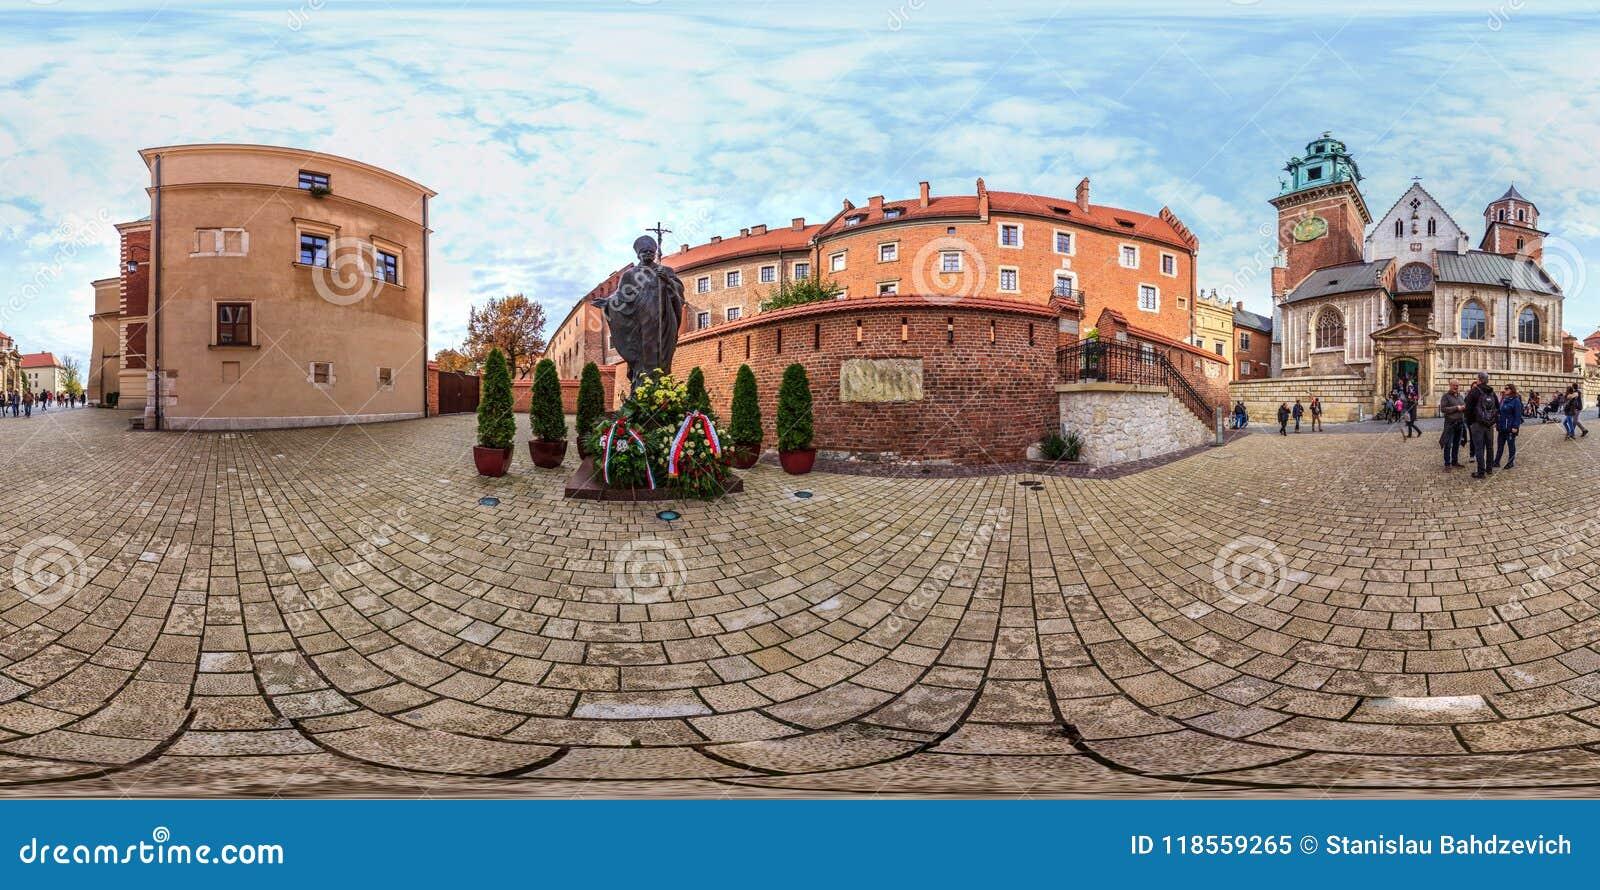 Krakov - 2018年:教宗若望保禄二世的纪念碑在克拉科夫 3D有360视角的球状全景 为虚拟现实准备 f